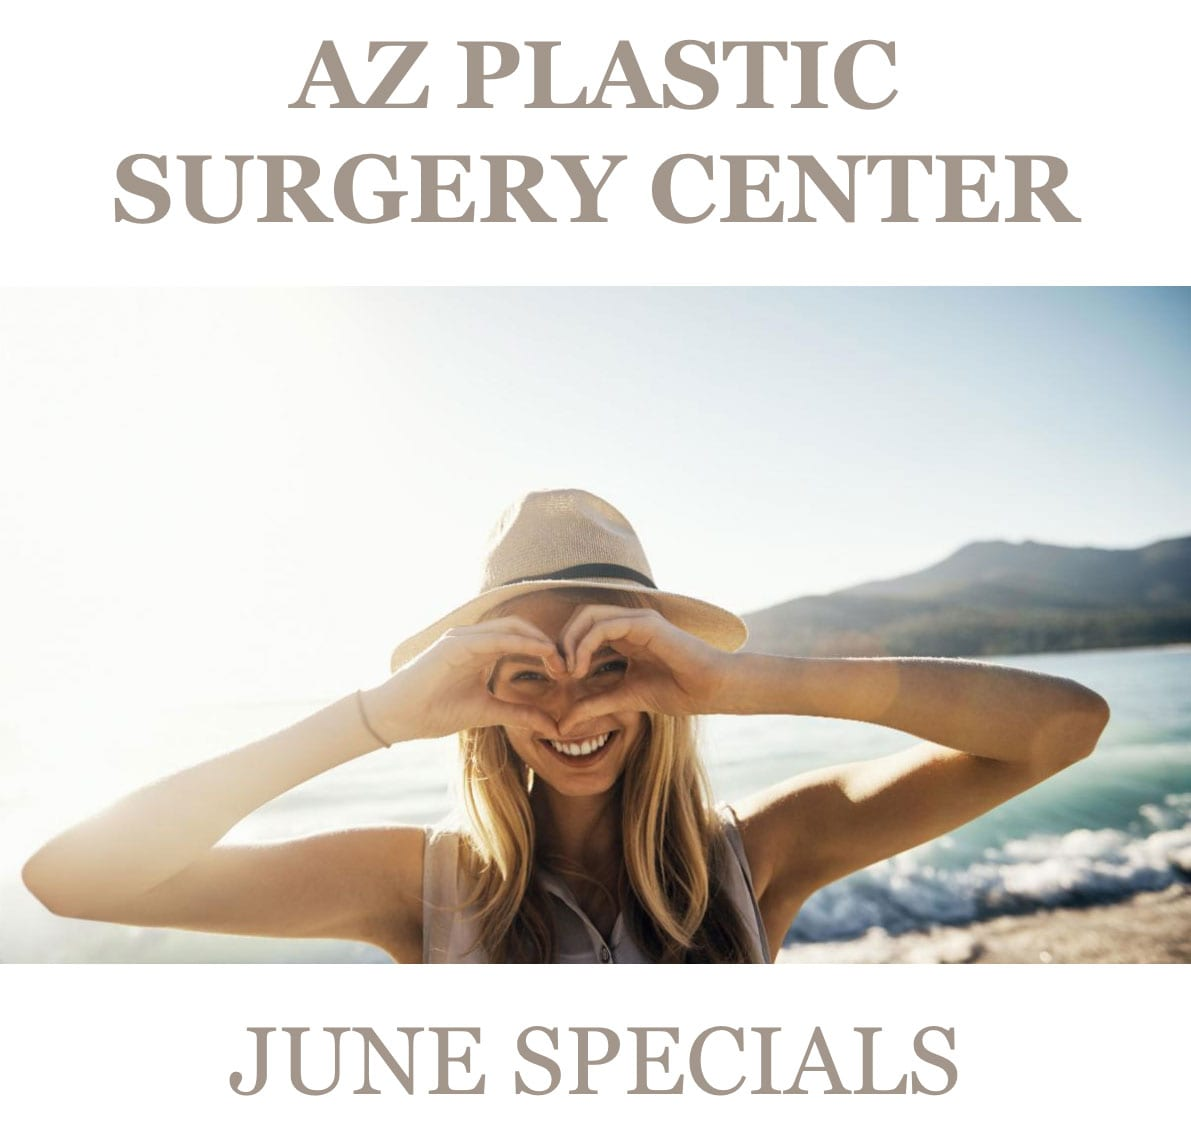 AZ Plastic Surgery Center: June Specials